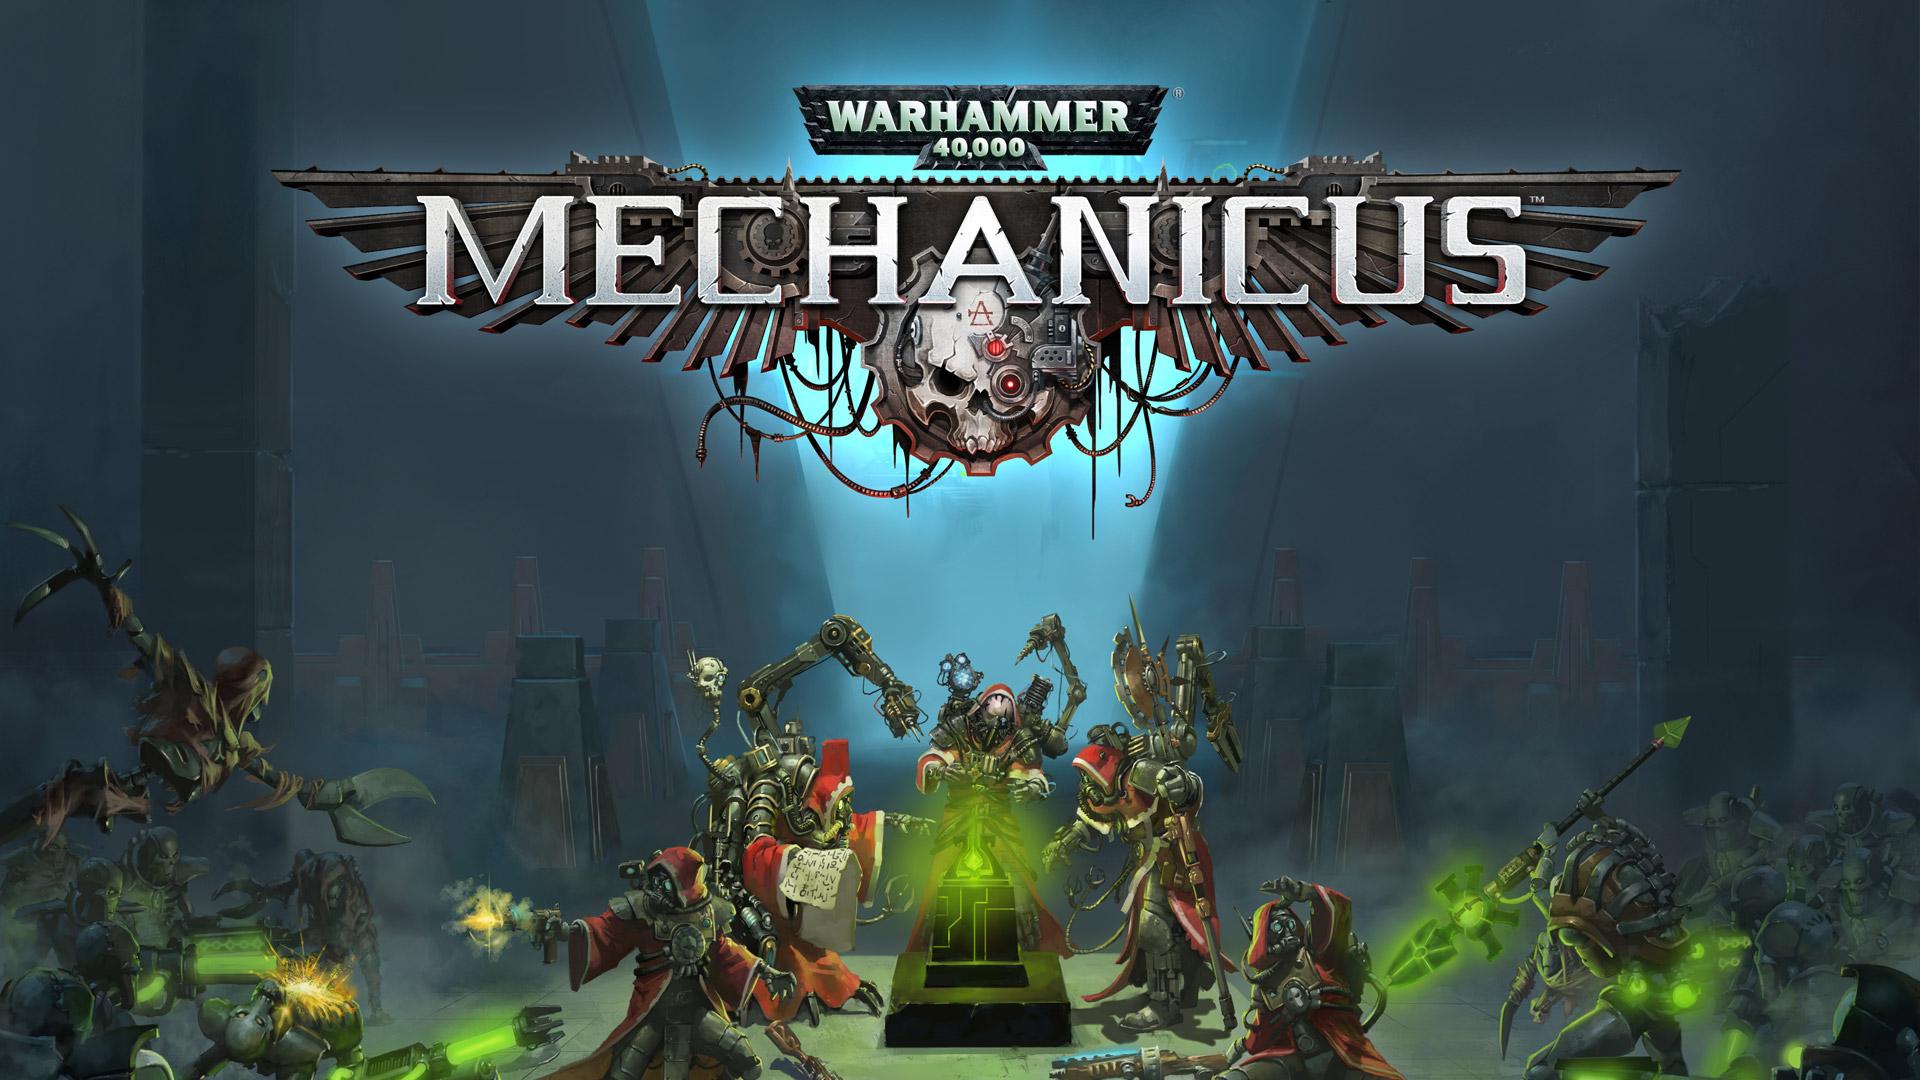 Warhammer 40,000: Mechanicus Wallpaper in 1920x1080